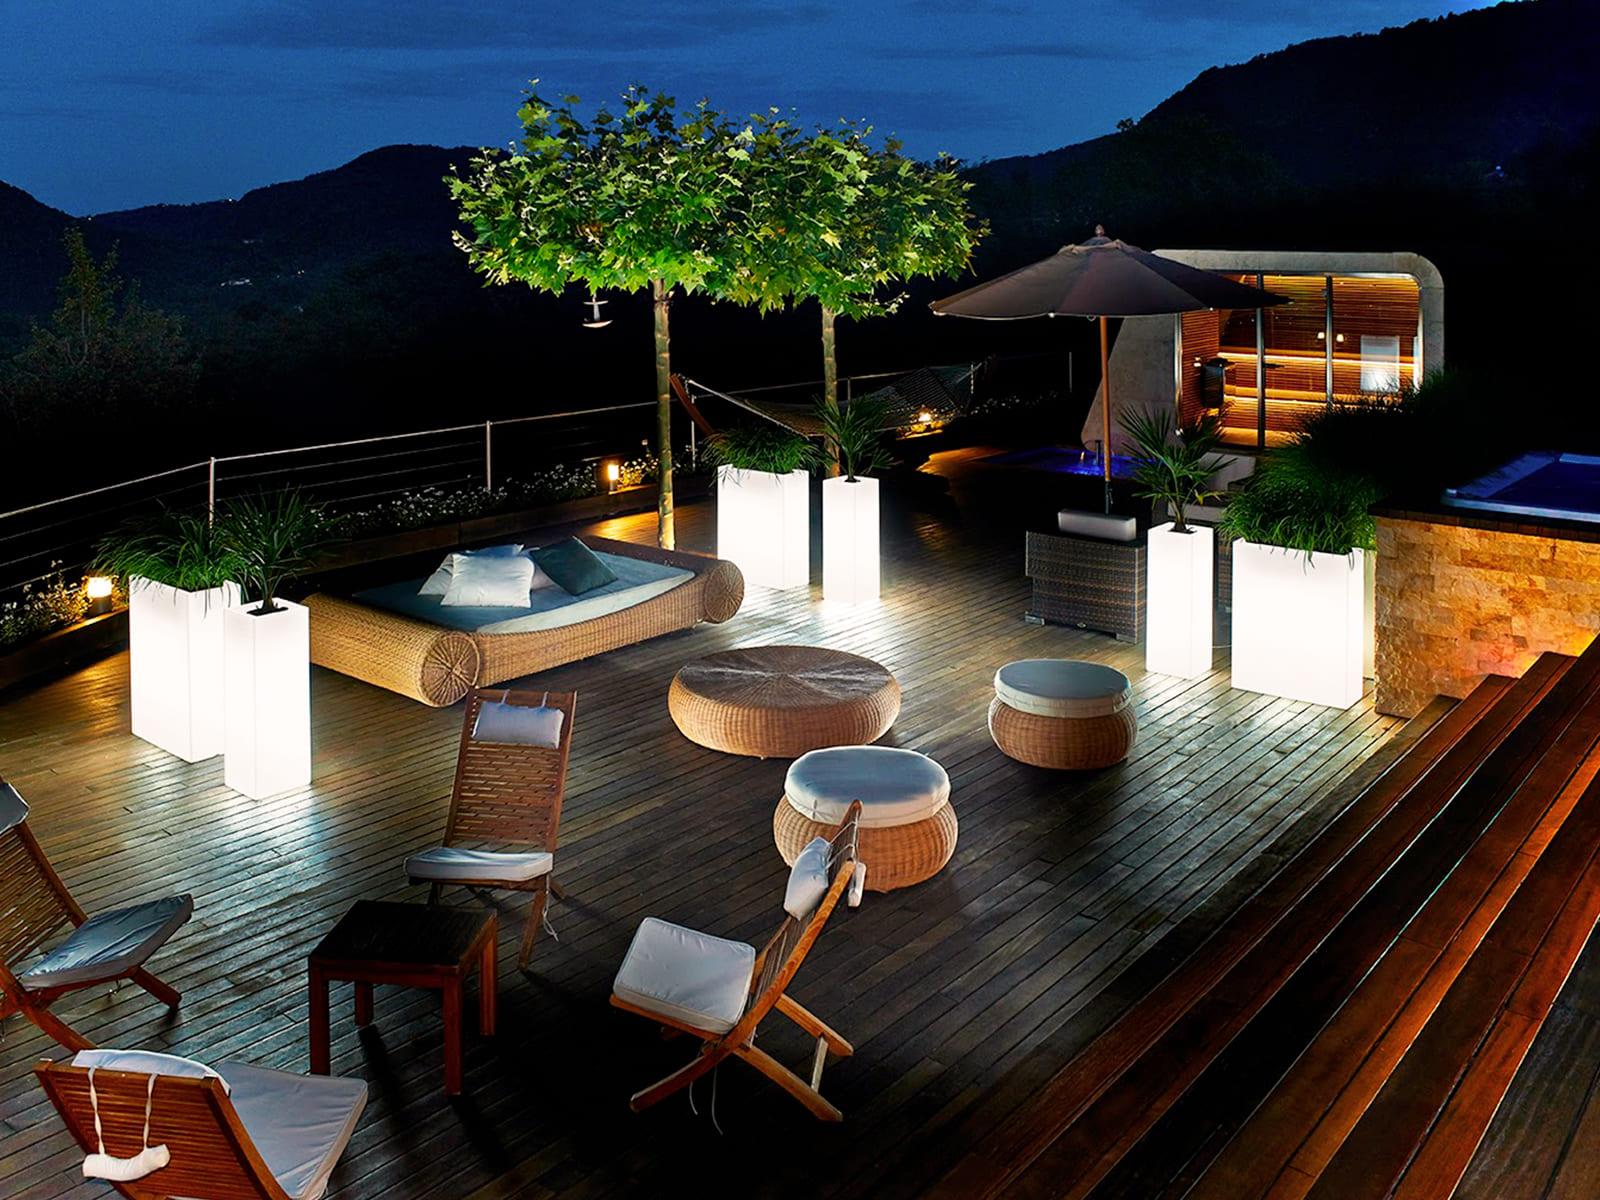 blog-vegetacion-decoracion-bares-restaurantes-11_HIDROJARDIN-Bañeres